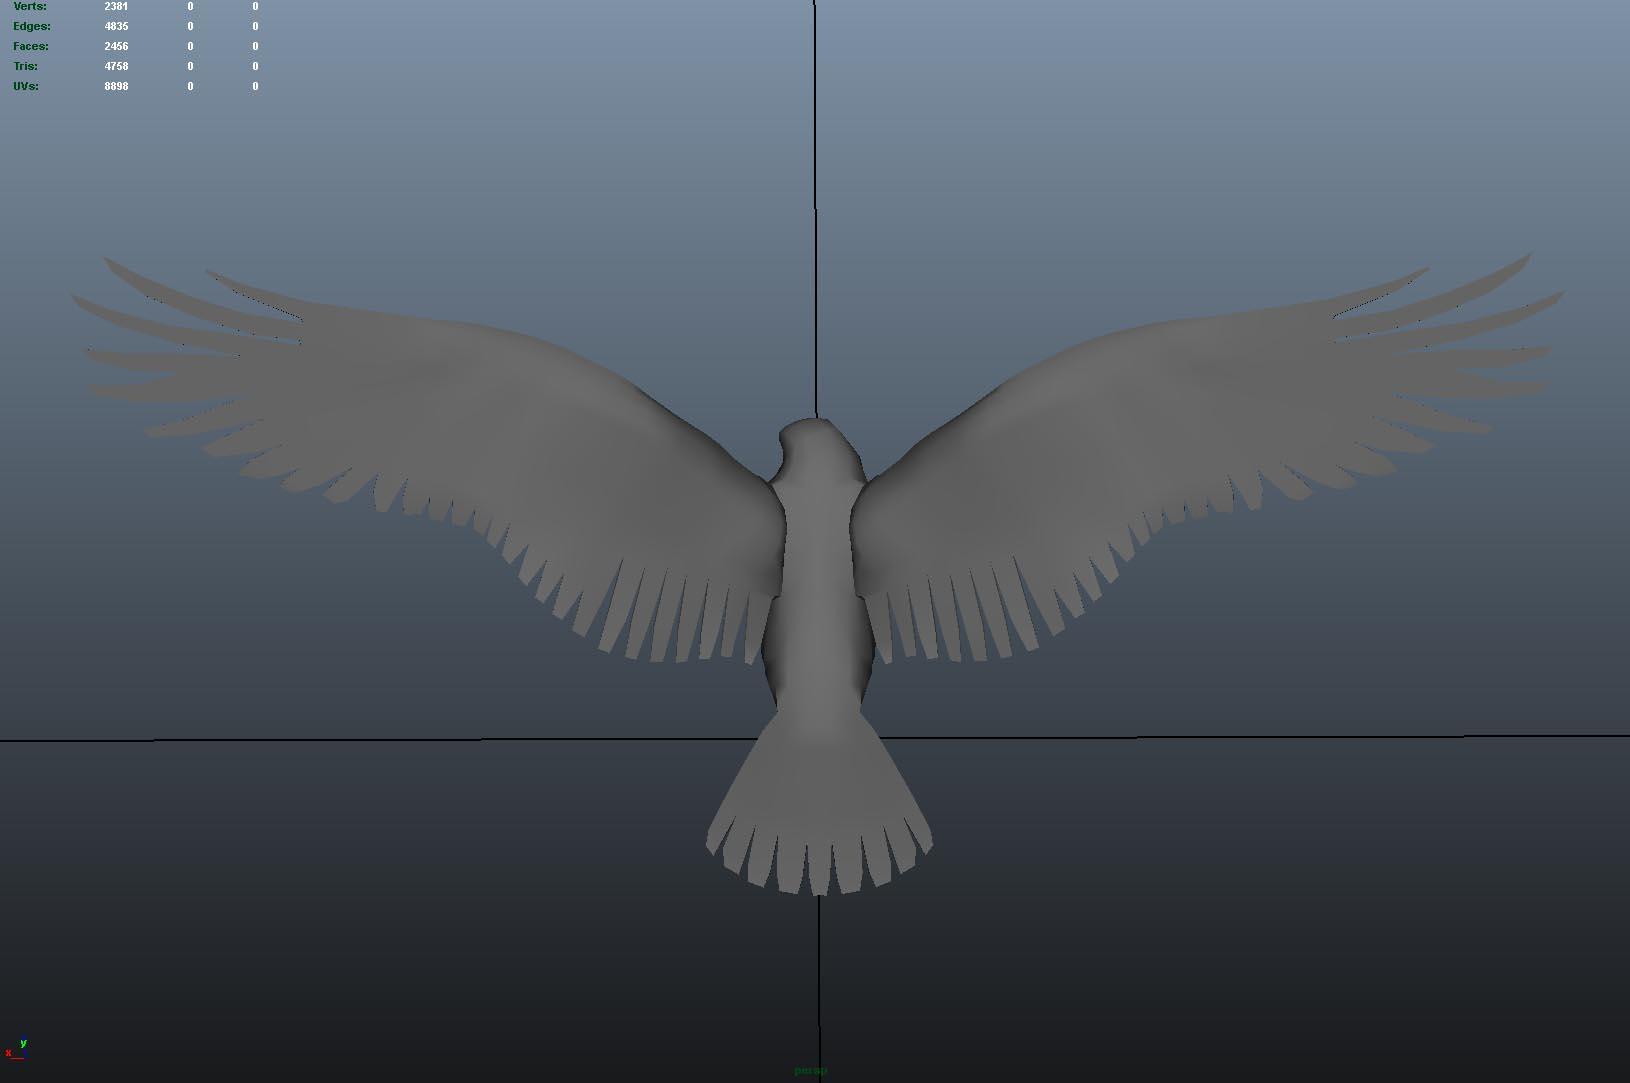 Eagle_Top_Shaded.jpg